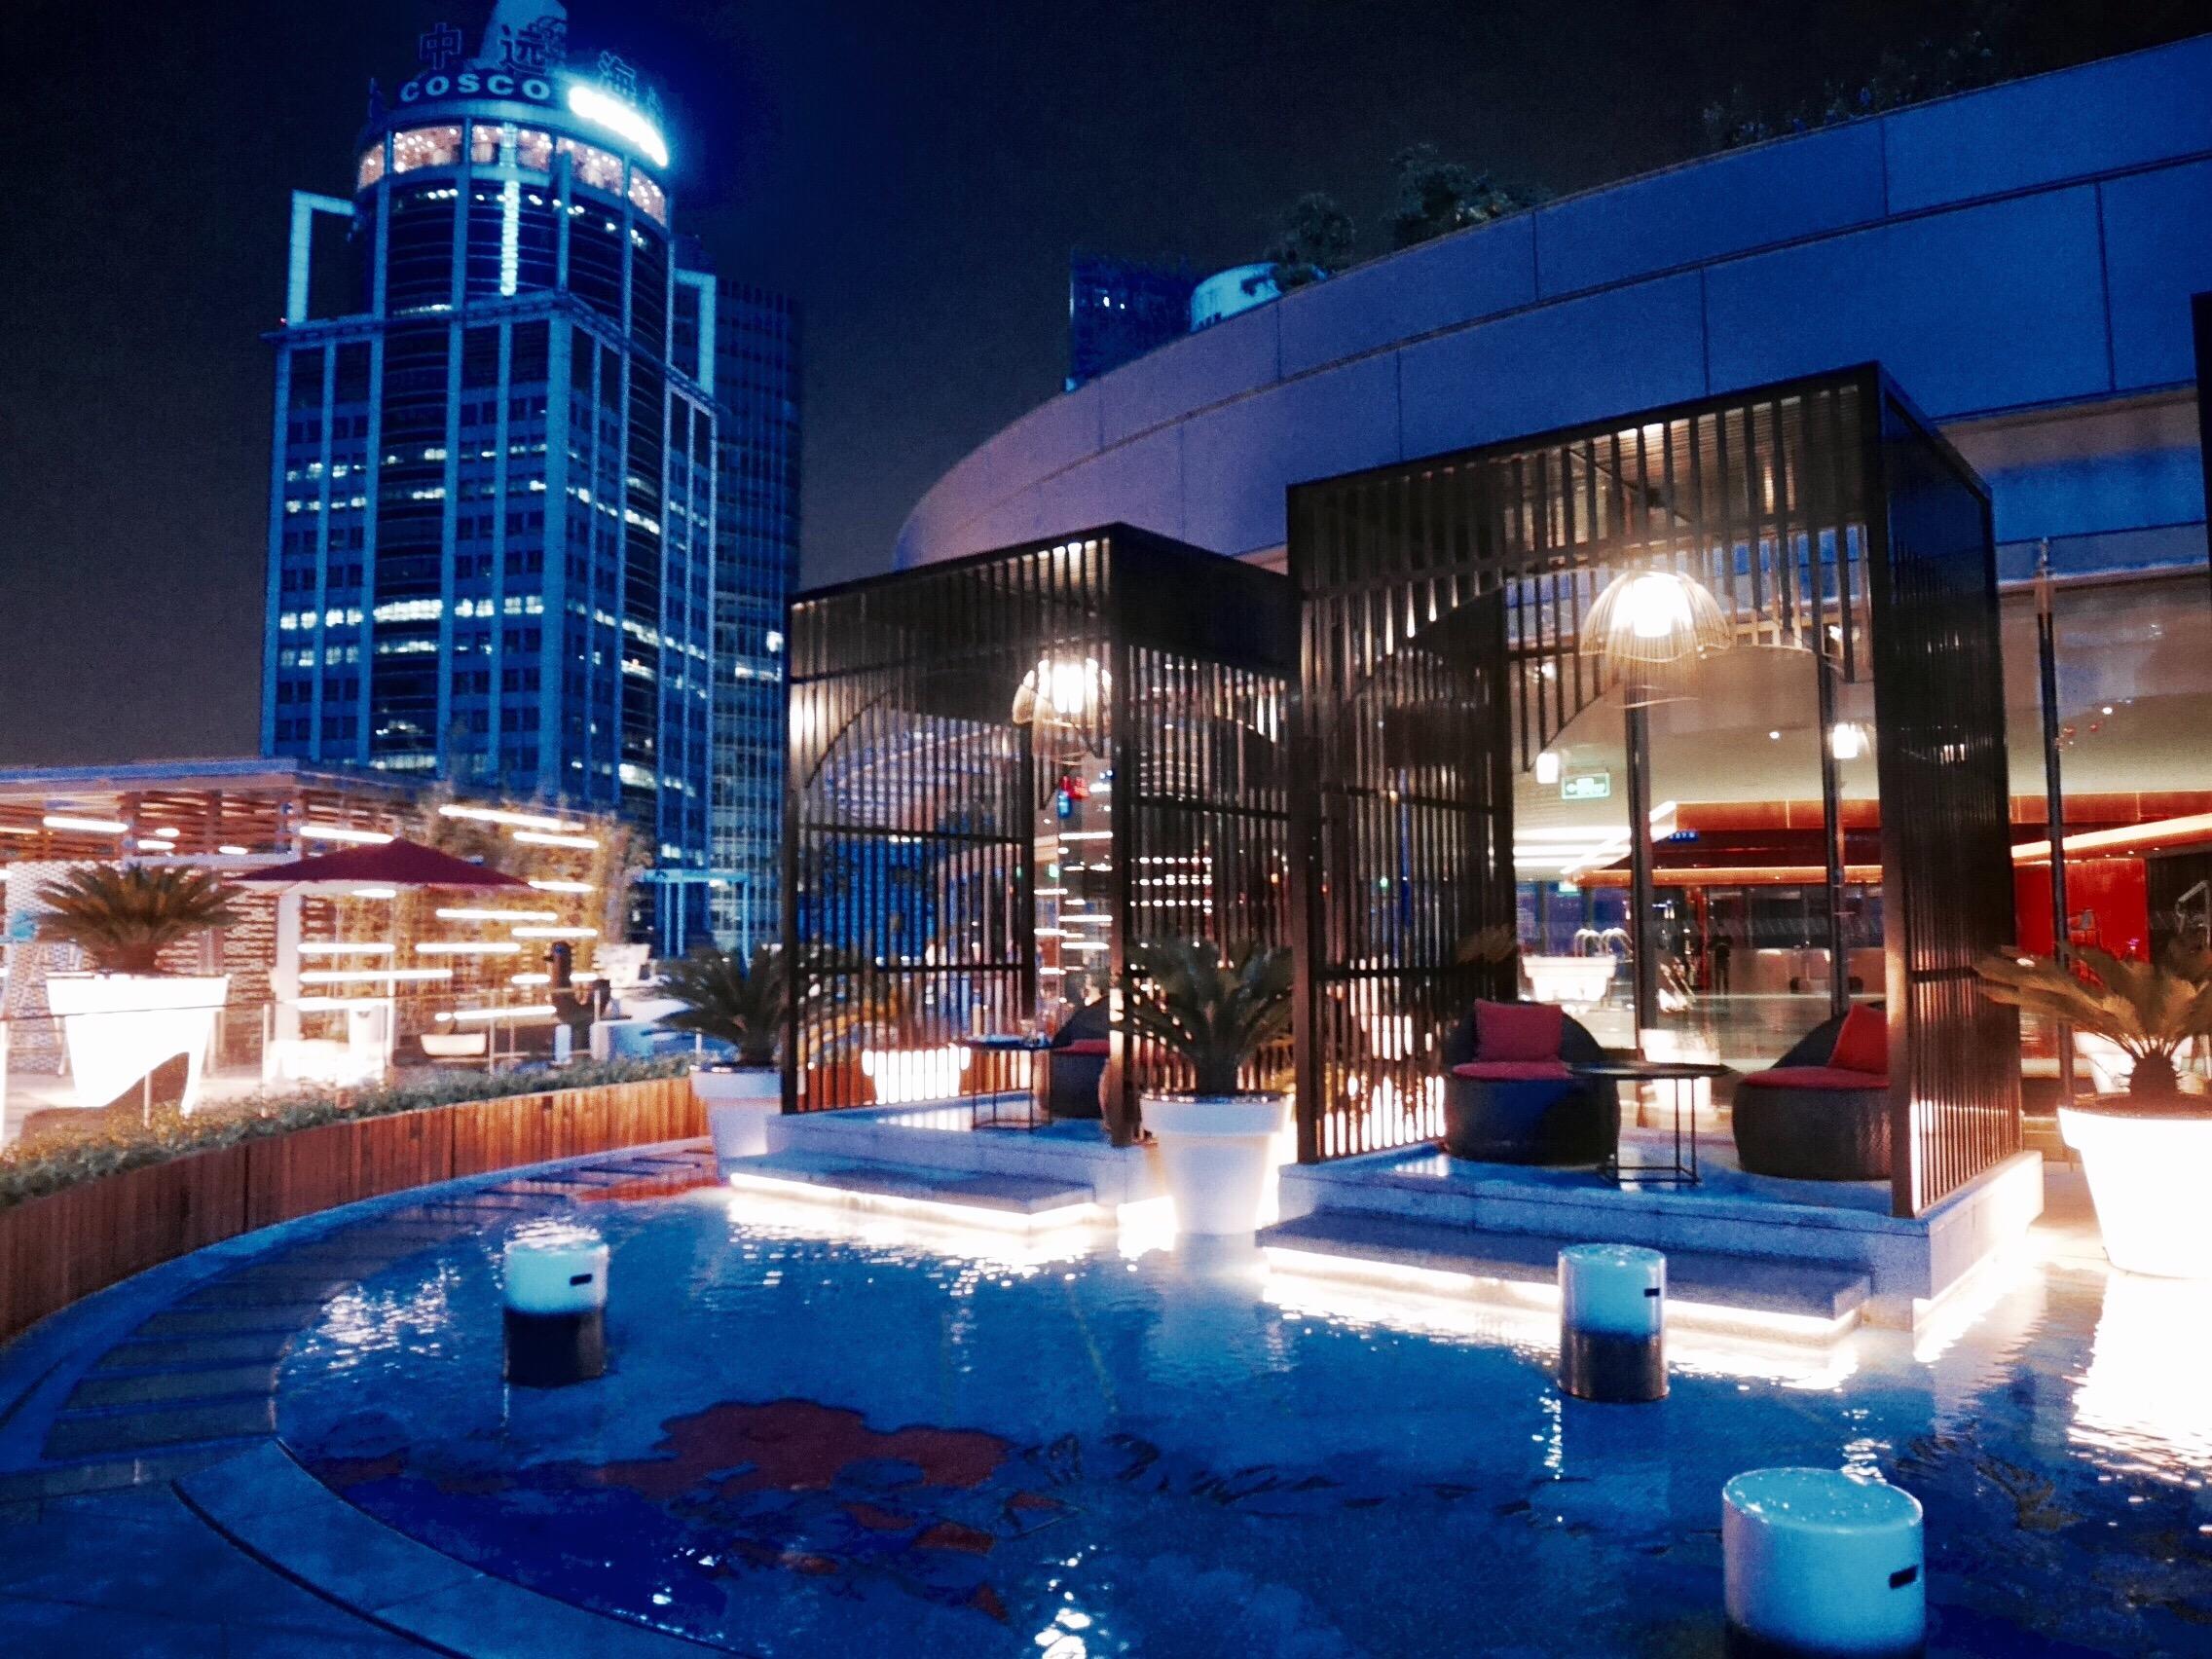 835397b7 9997 44d0 9b00 0fb2e8e4ed45 - W HOTEL - 上海No.1の景色を楽しむホテル